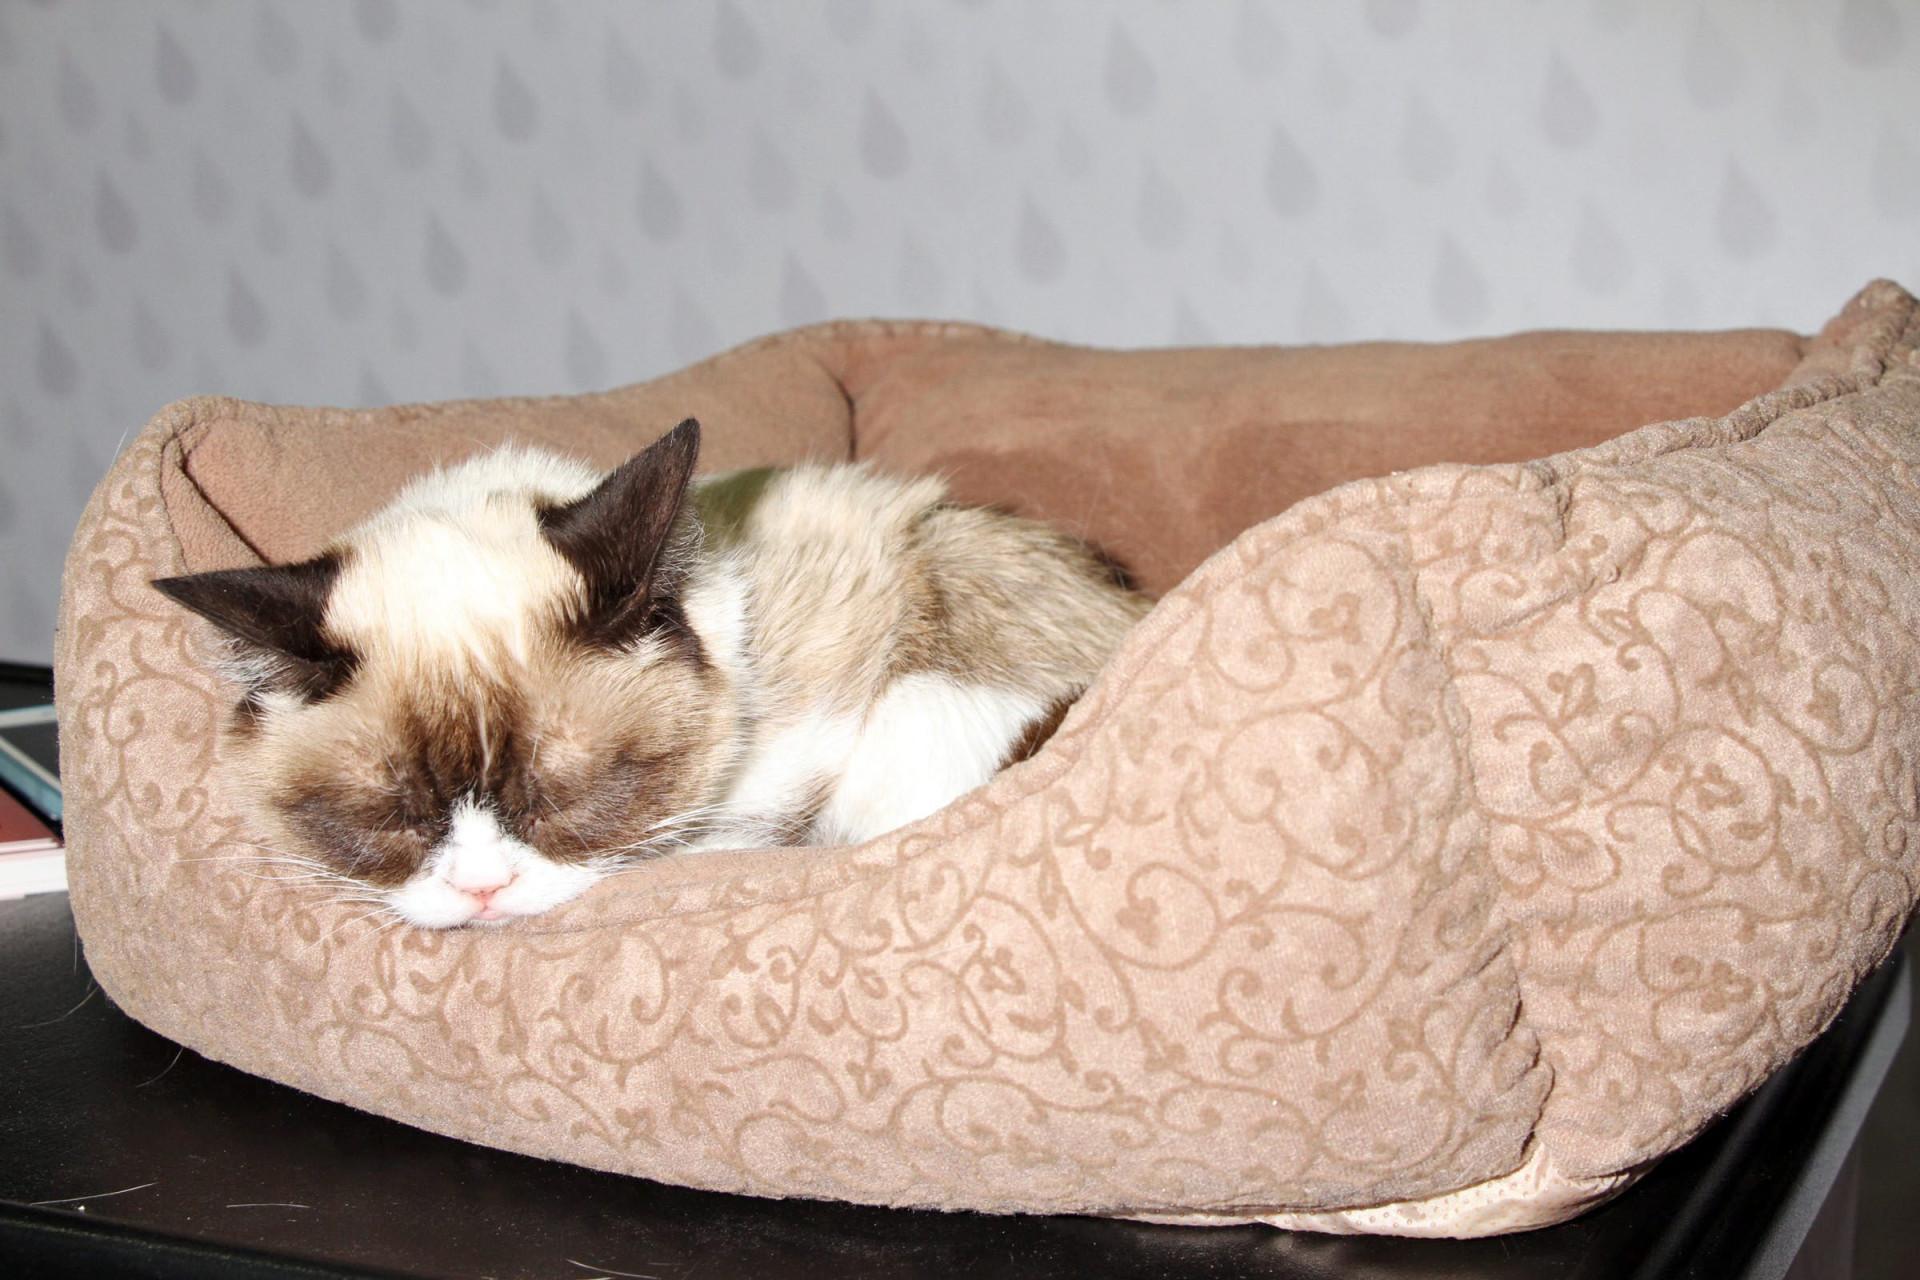 R.I.P. Grumpy Cat: relembre a gata rabugenta mais viral da internet!